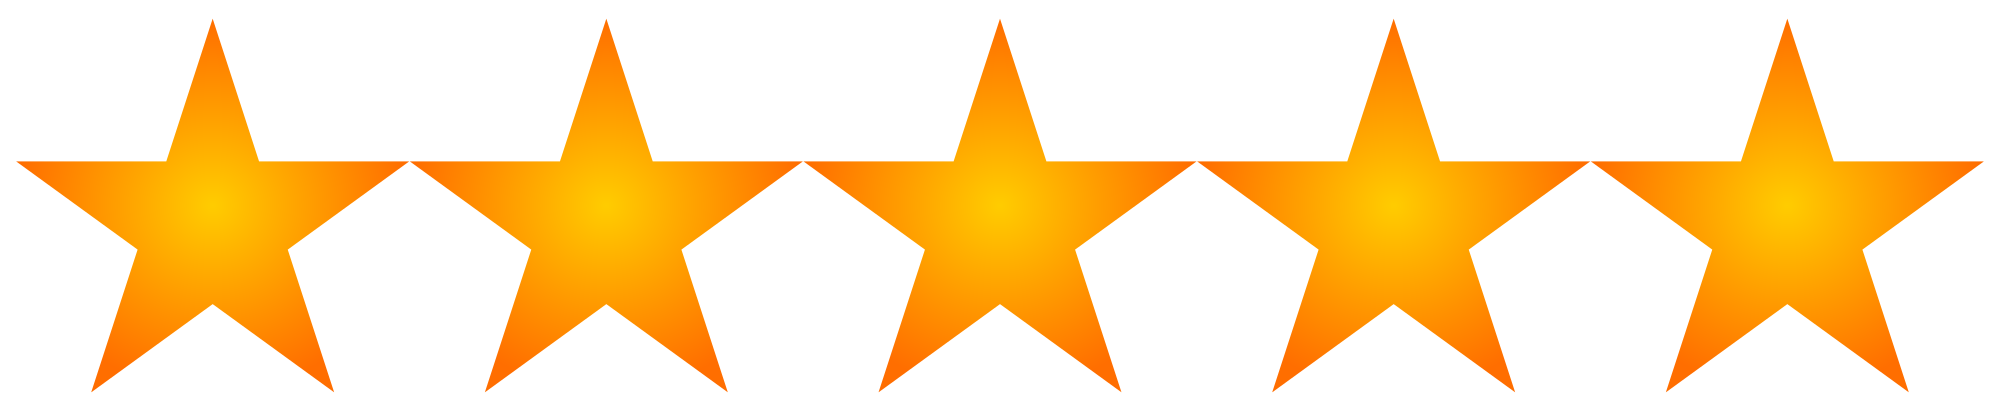 sandyfields 5 star